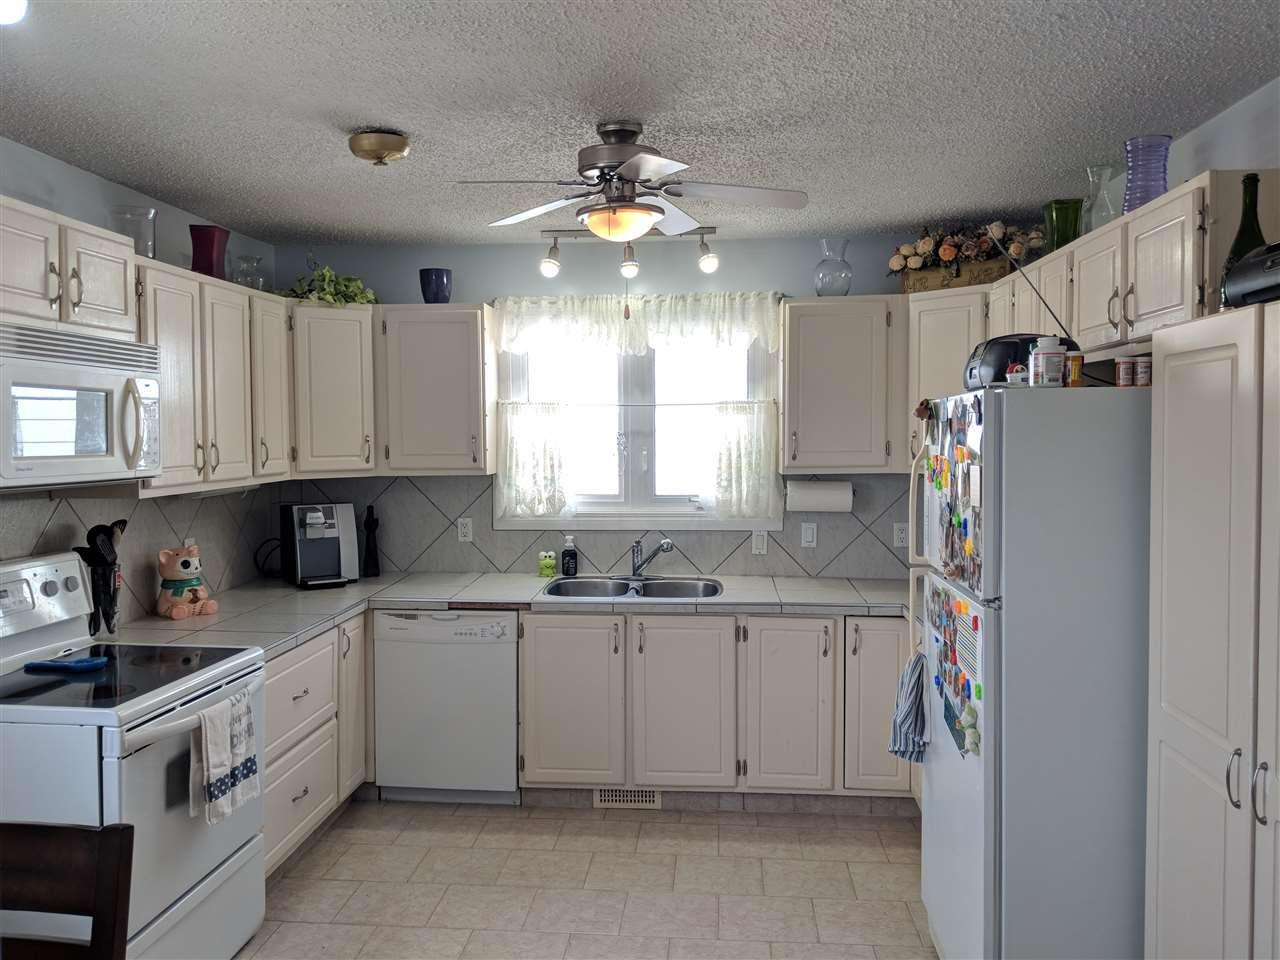 Photo 3: Photos: 4740 48 Street S: Clyde House for sale : MLS®# E4152983